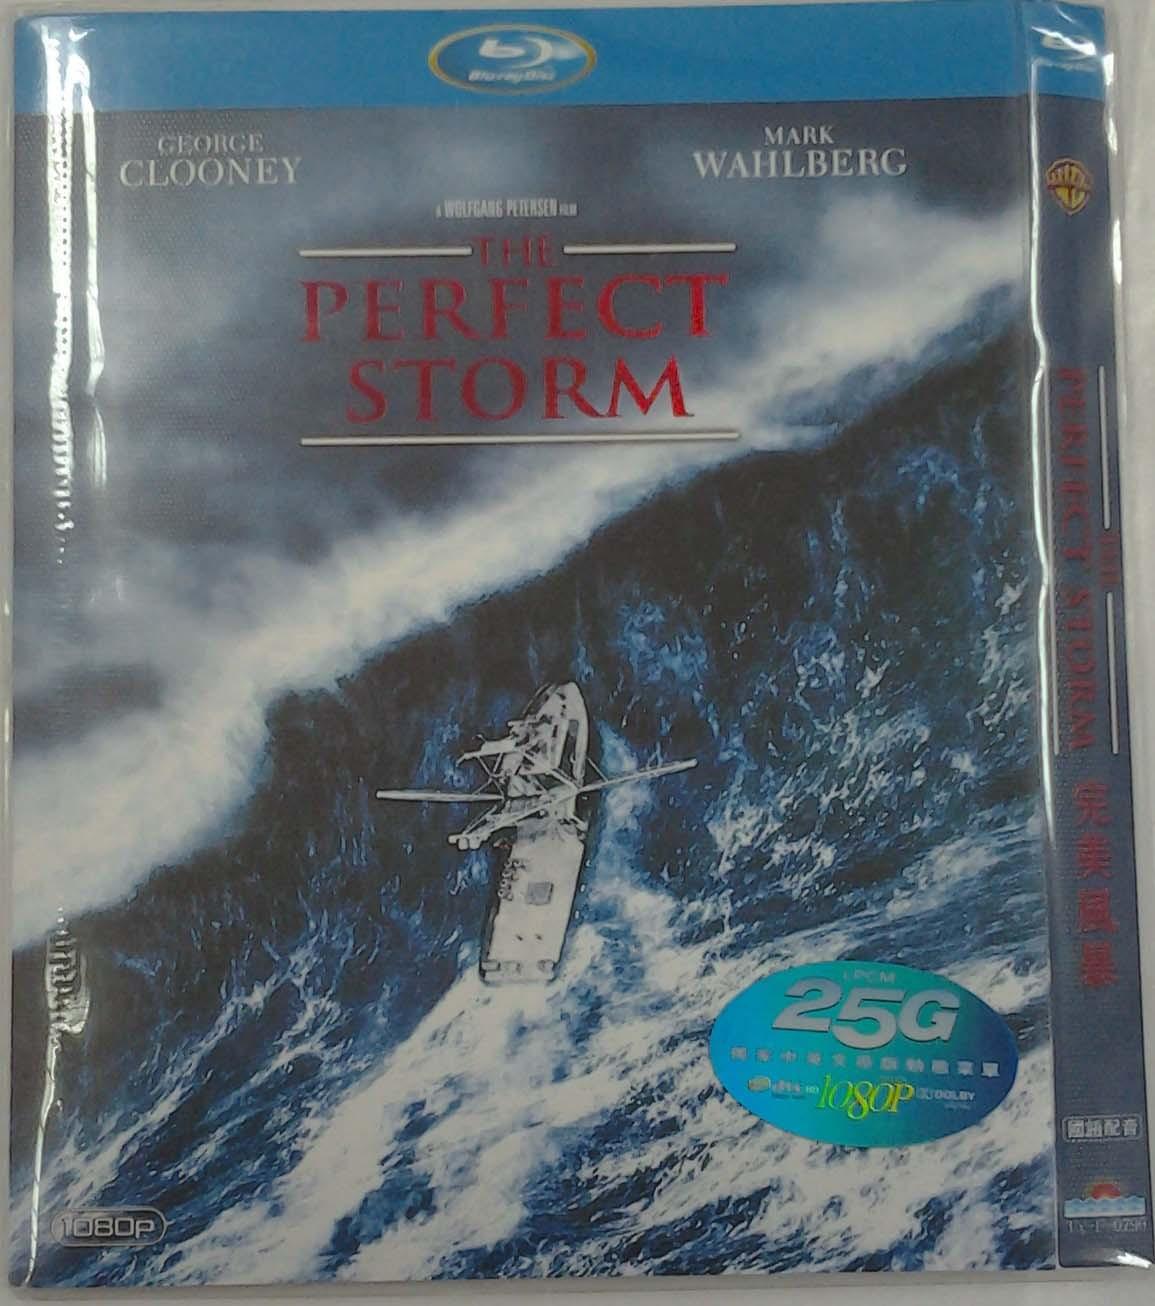 完美风暴  Perfect Storm  35-014